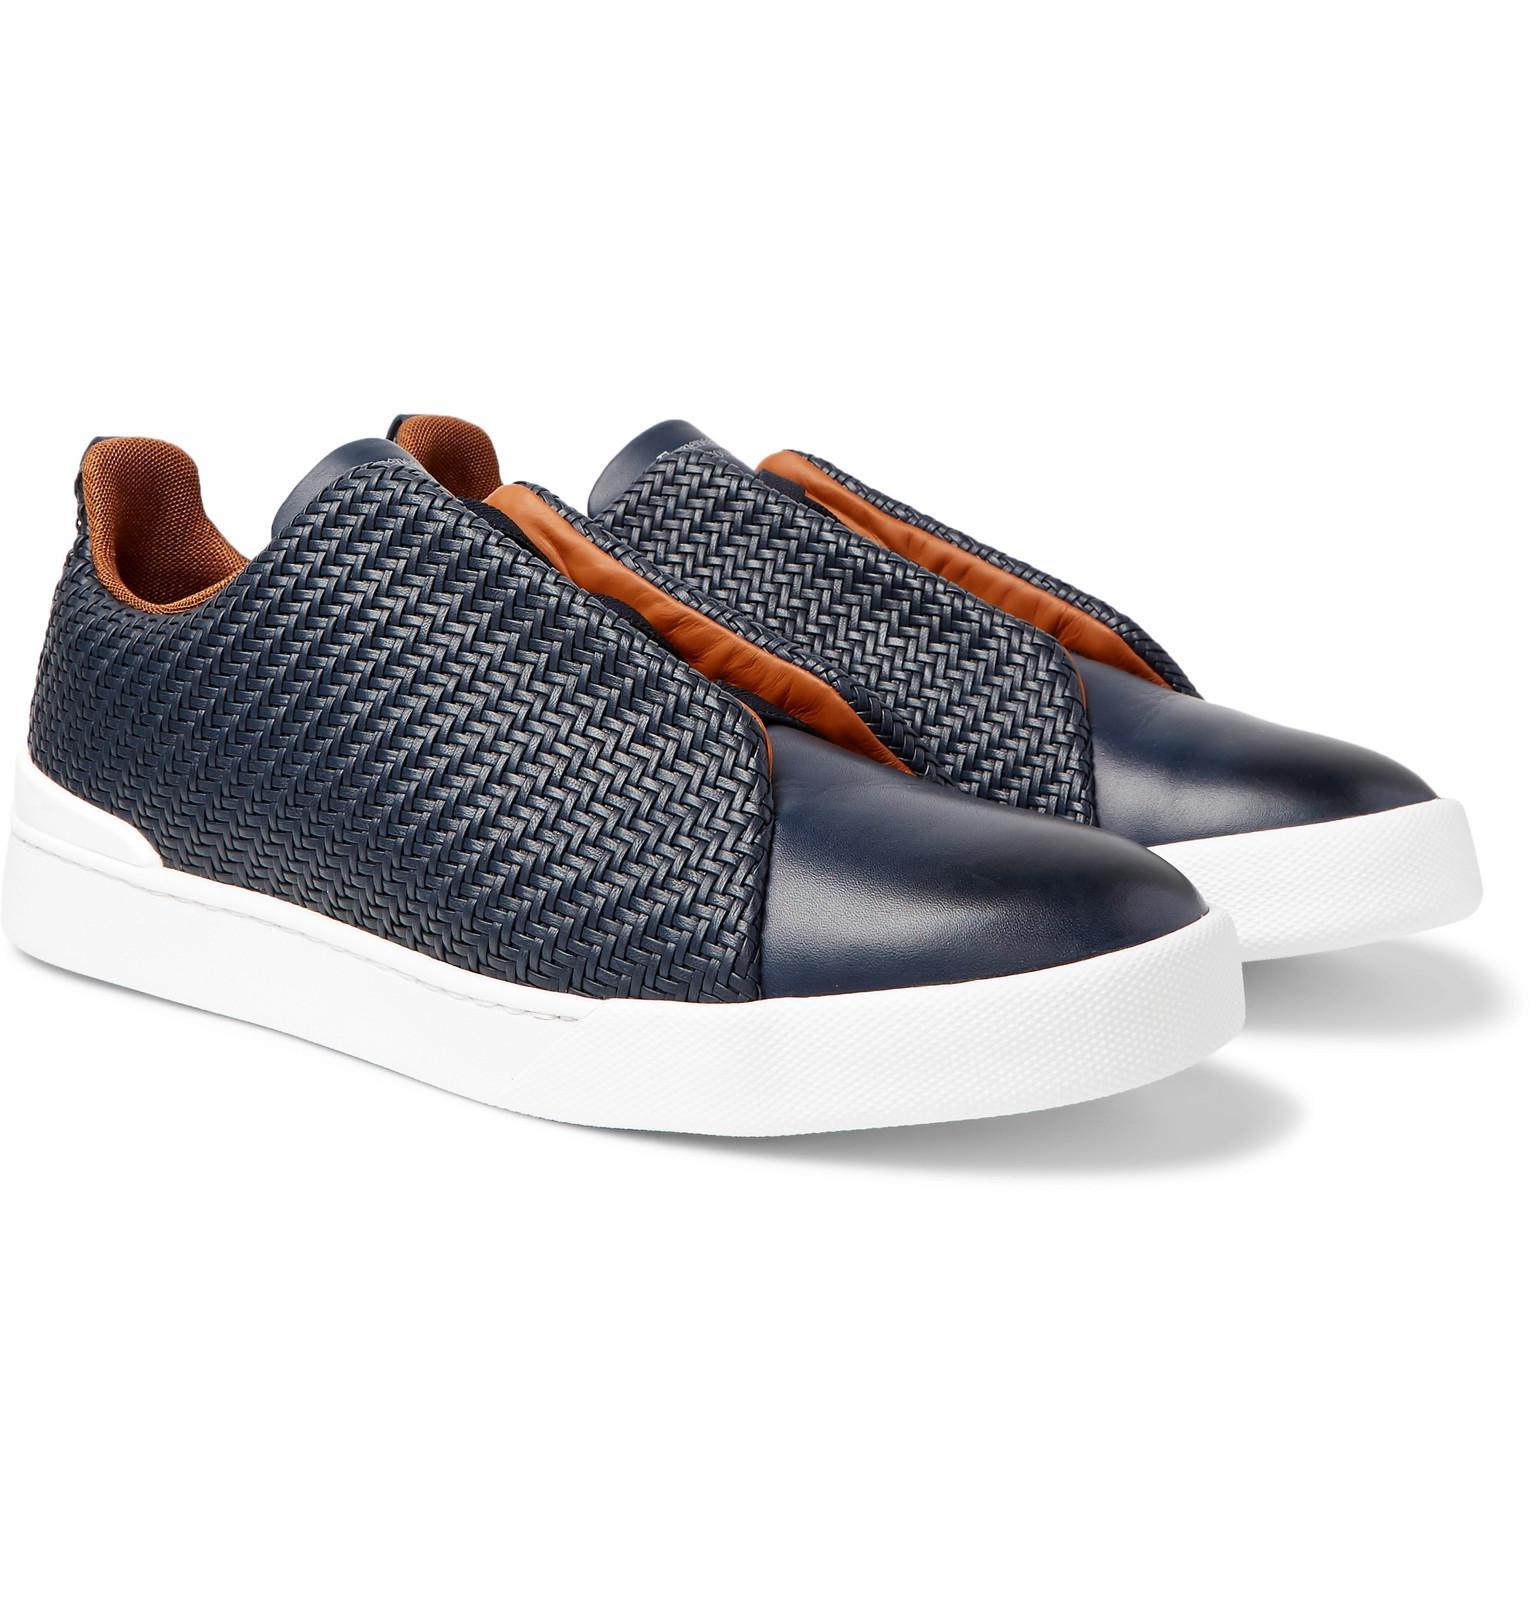 a8888cb6 Ermenegildo Zegna Blue Triple Stitch Pelle Tessuta Leather Slip-on Sneakers  for men